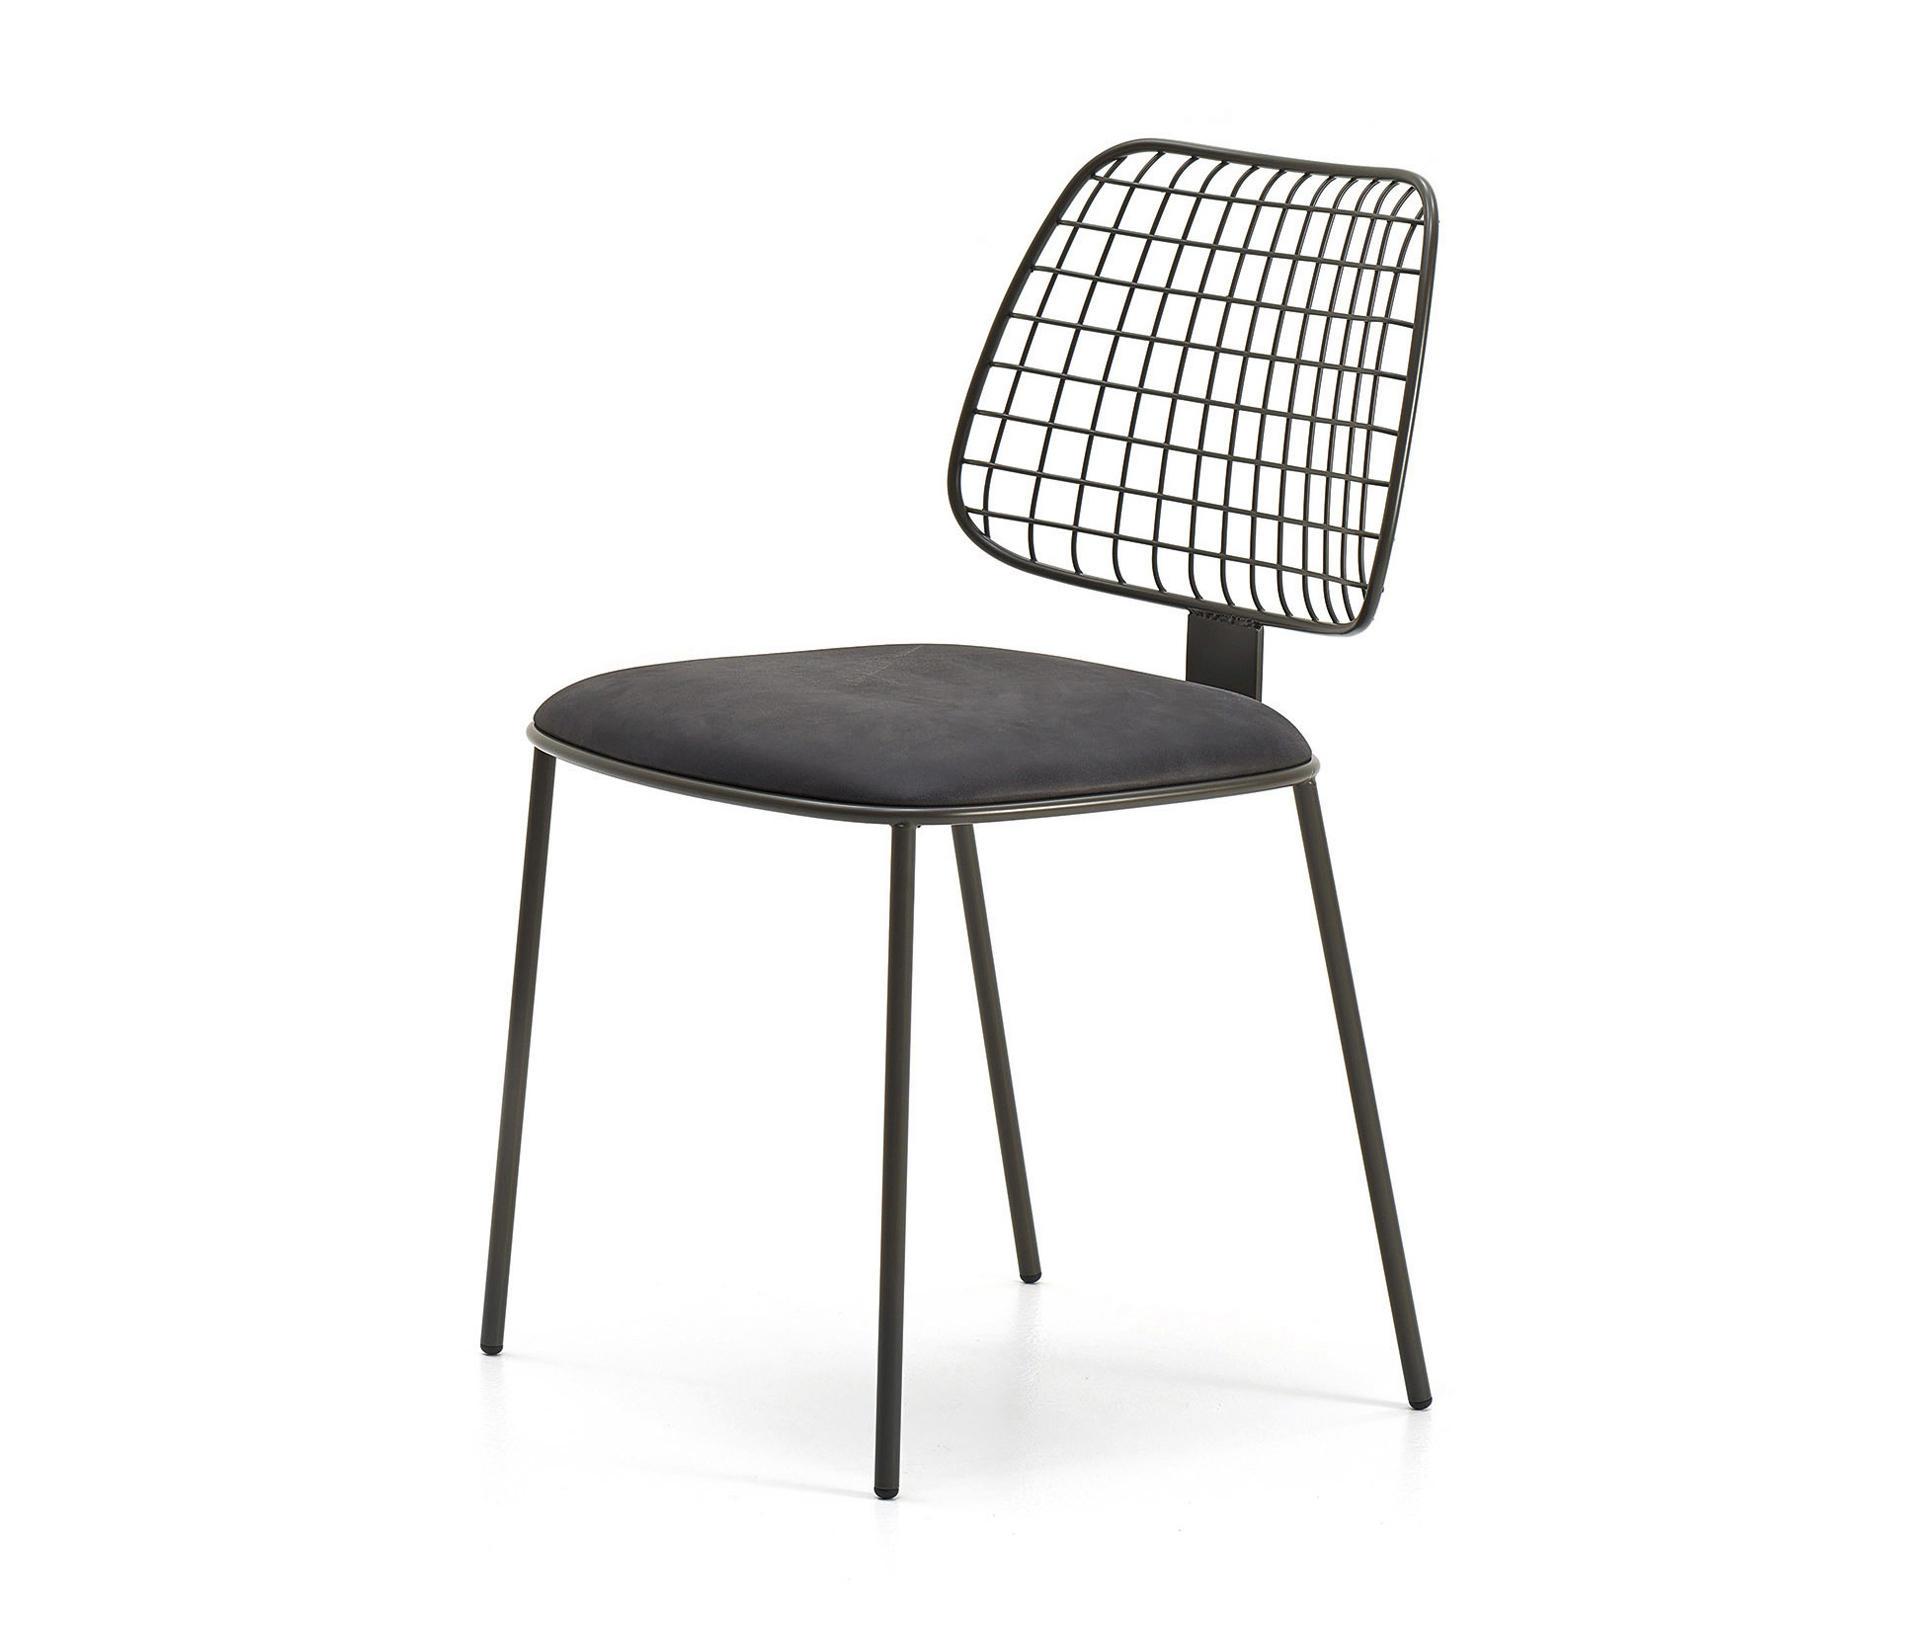 Summerset Chair By Varaschin | Chairs ...